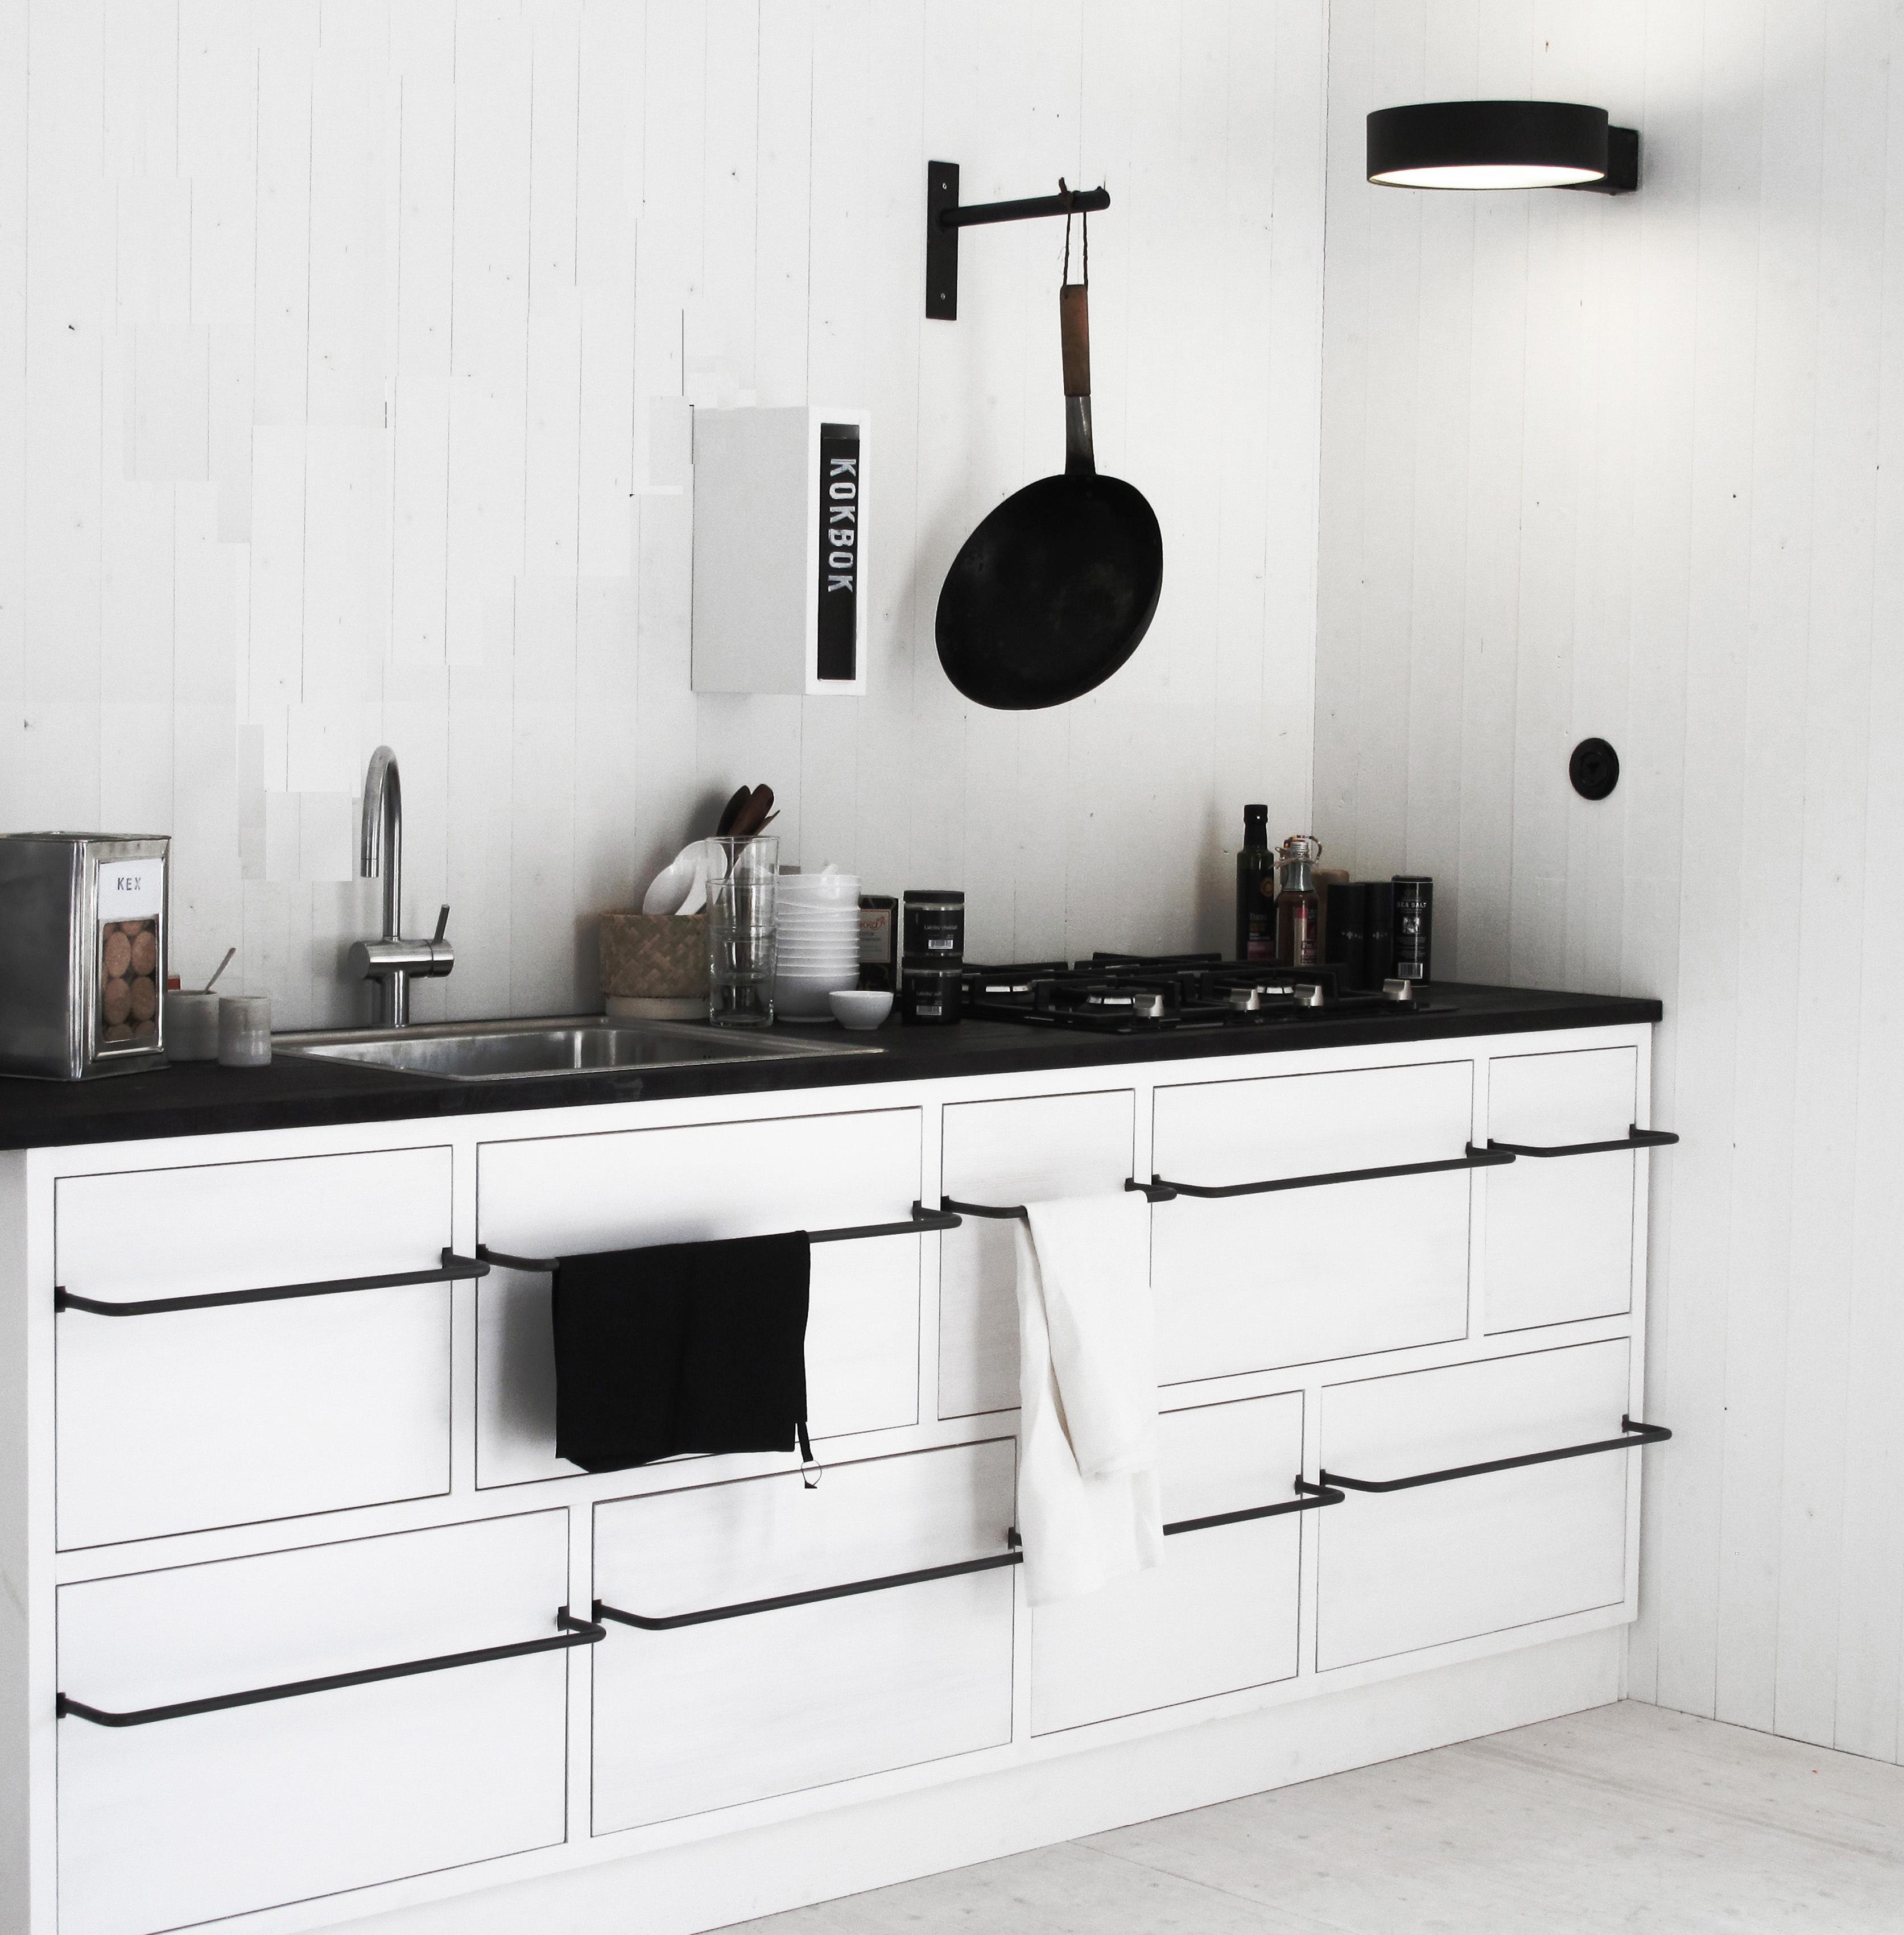 Leva Husfabrik Kok Jansson : Bulthaup Kitchens diseno de cocinas en barcelona hans Kitchen island